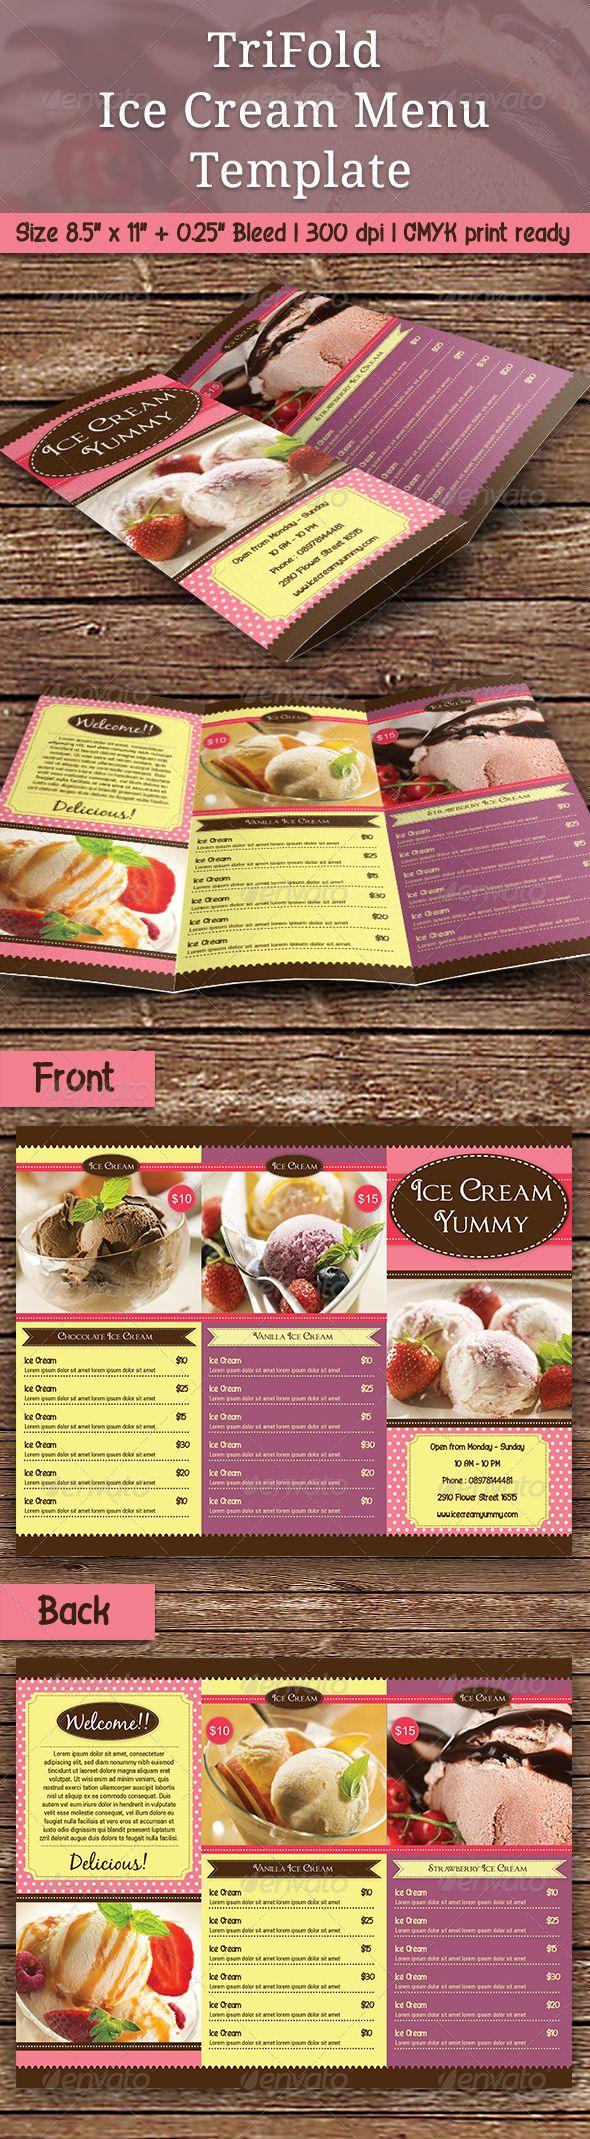 13 best Ice Cream Catalog images on Pinterest | Flyer template ...